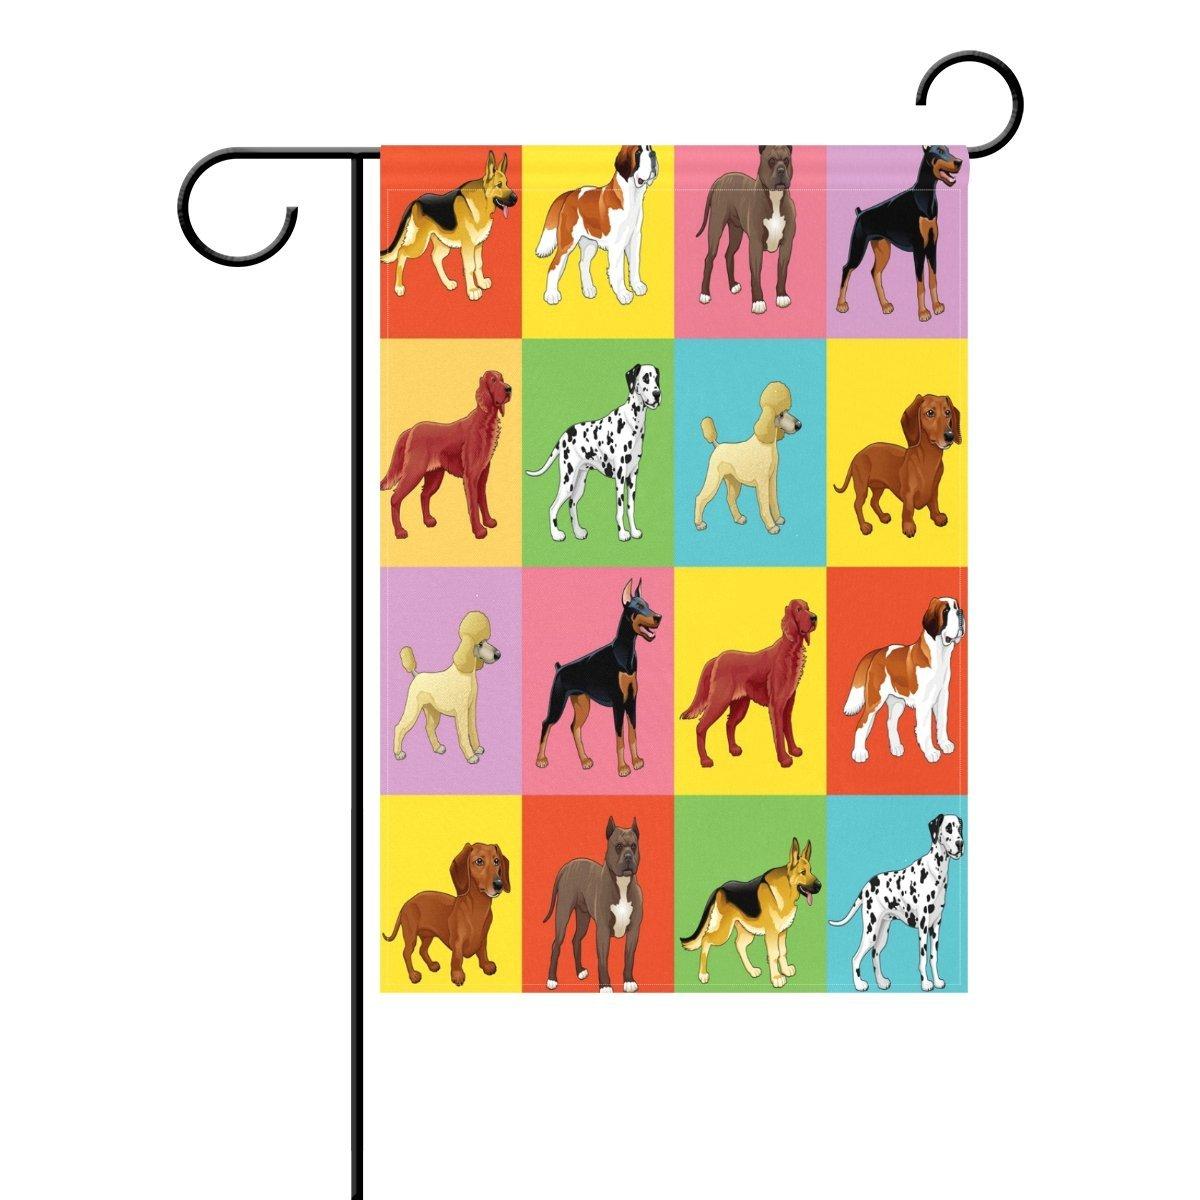 "WOZO Puppy Pug Chihuahau Dachshund Garden Flag 28"" x 40"" Polyester Outdoor Flag Home Party"